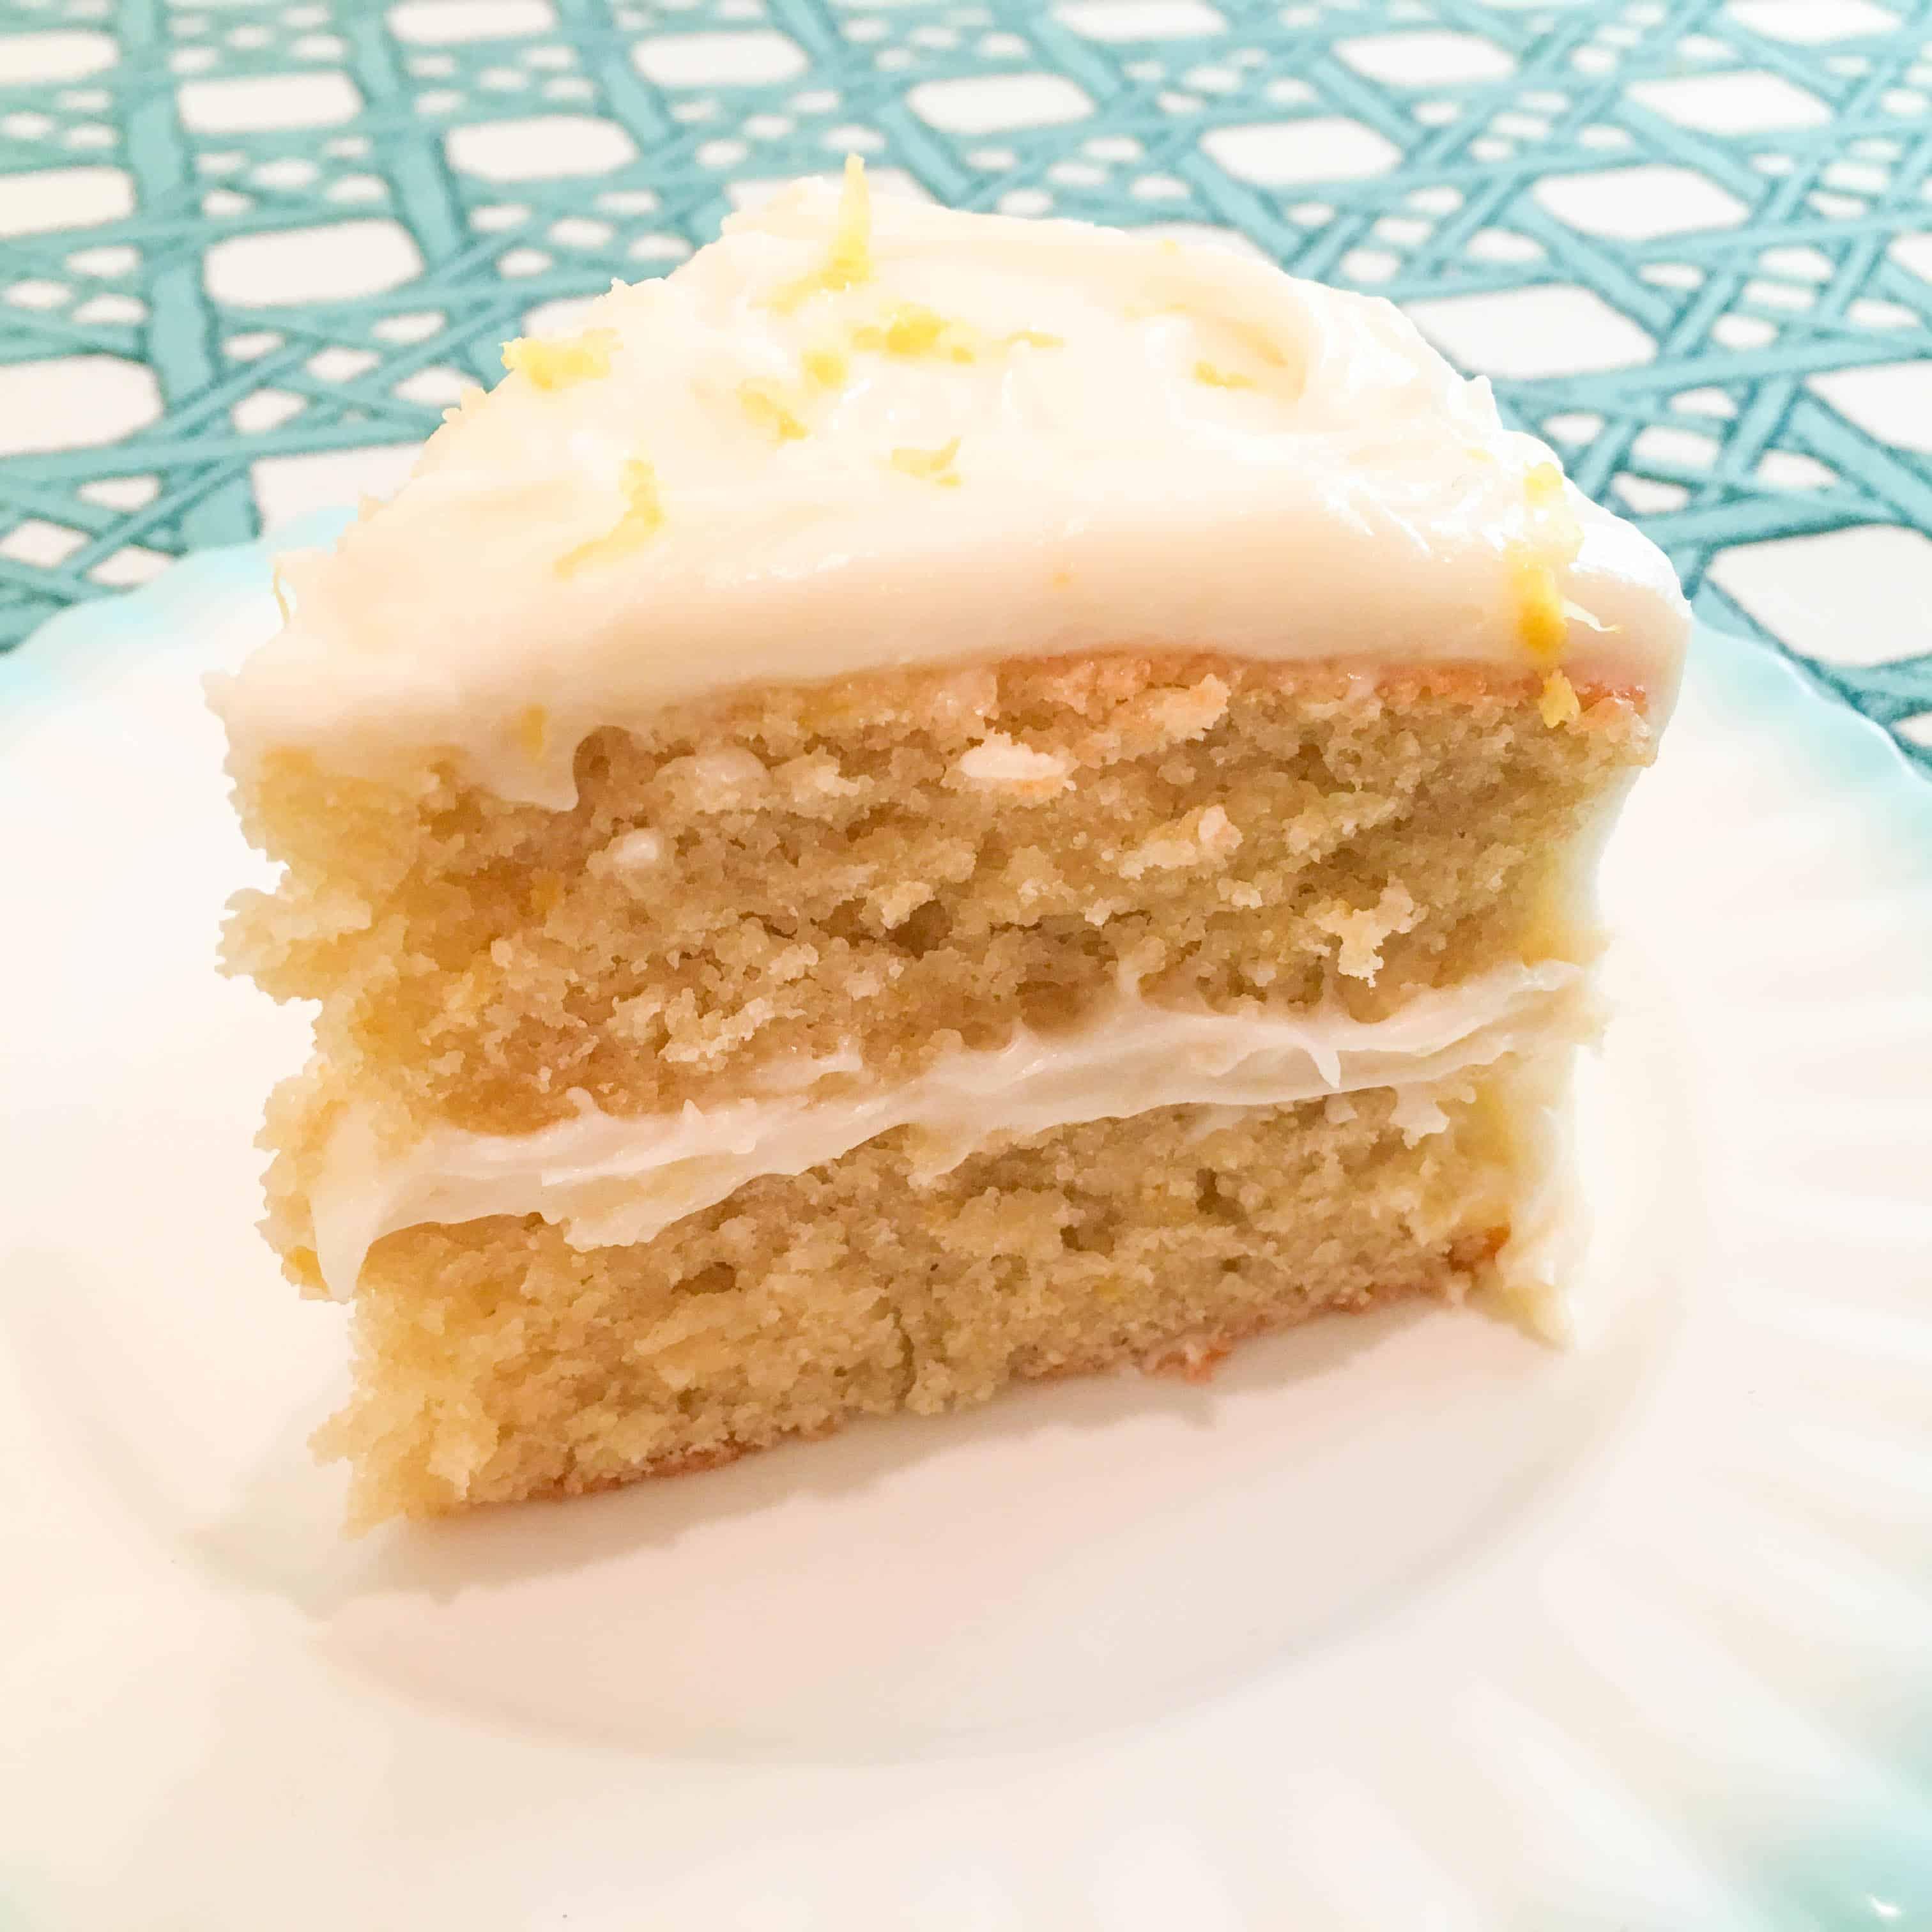 Lemon Chiffon Cake w/Lemon Cream Cheese Frosting